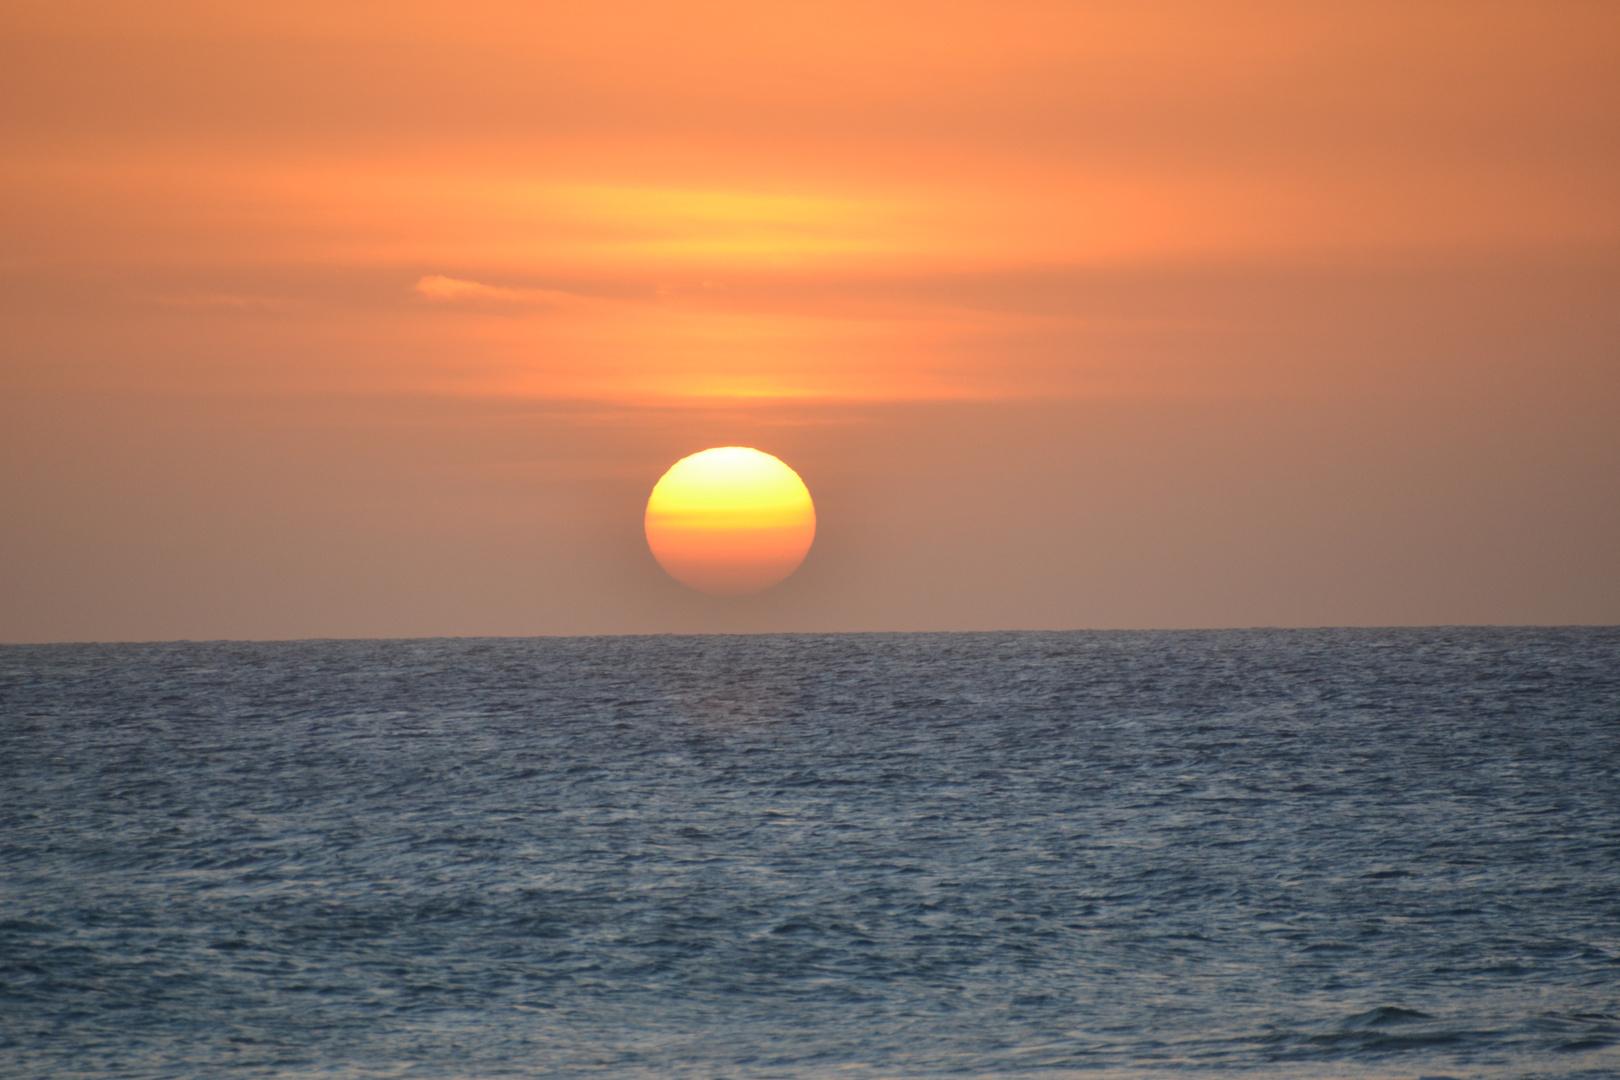 Sonnenuntergang in Santa Monica BoaVista